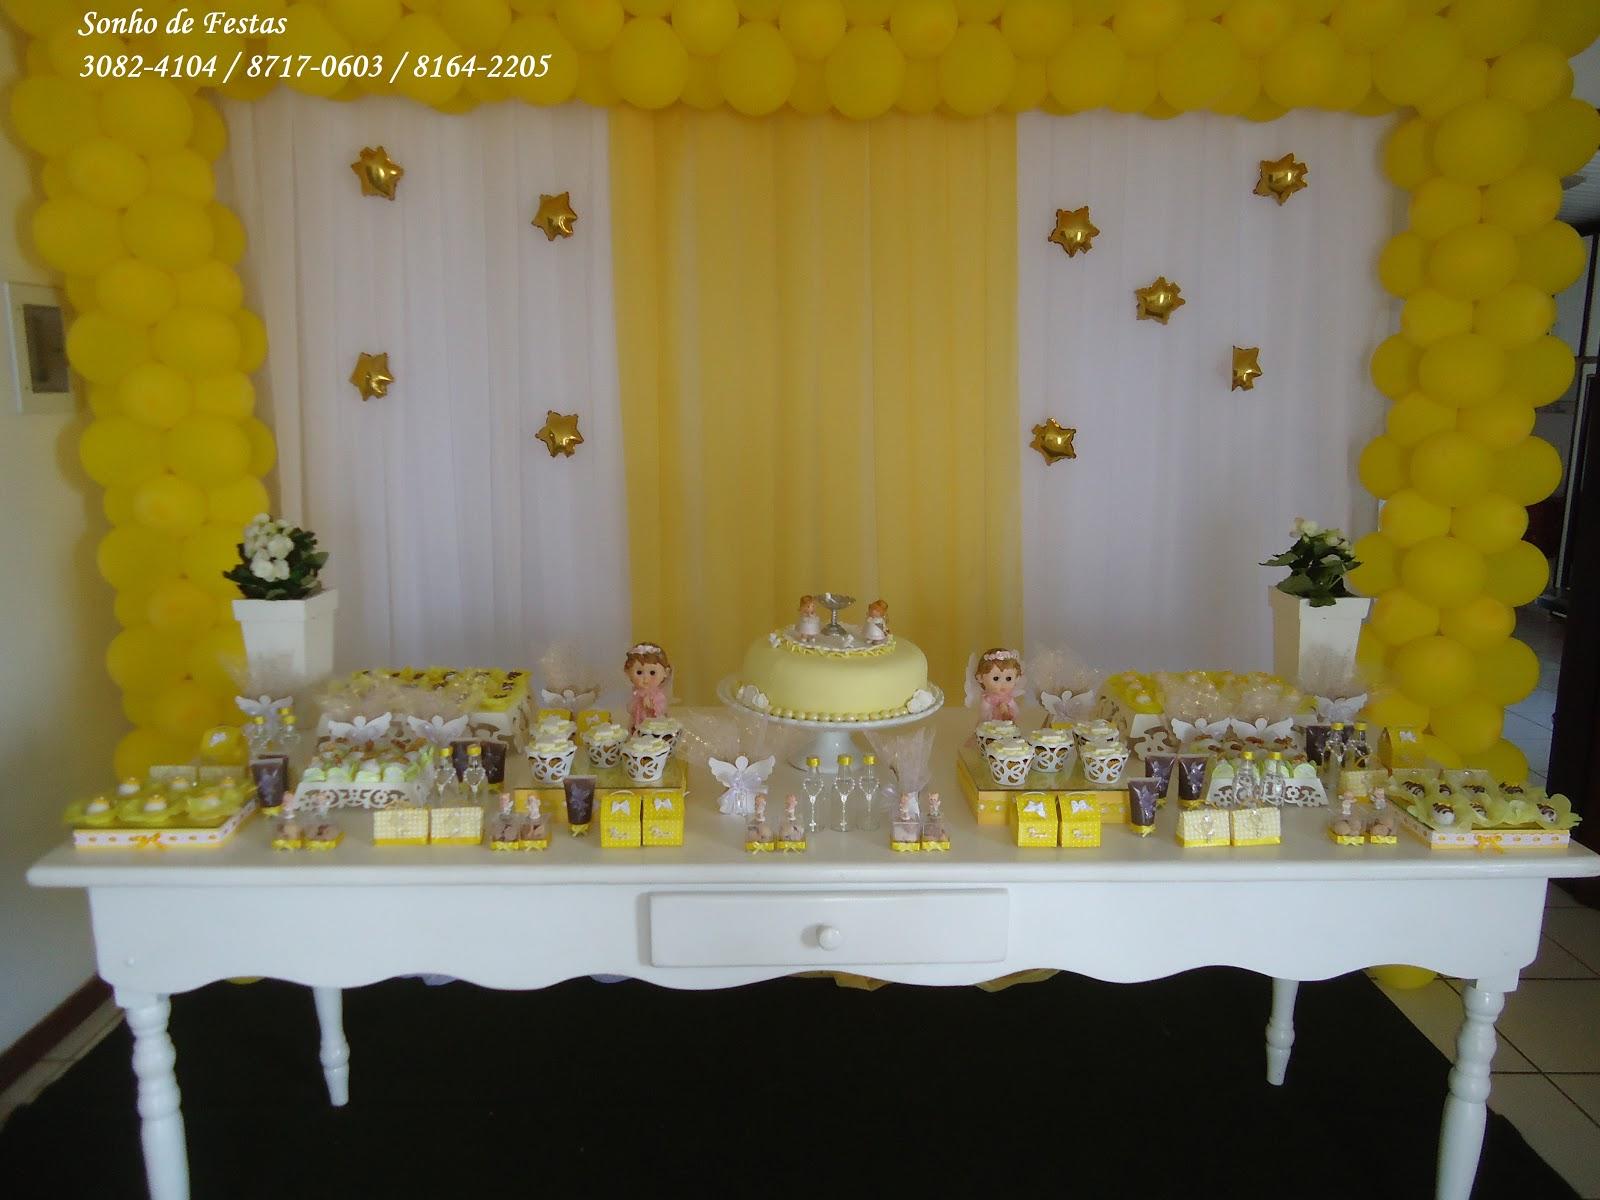 decoracao branco amarelo:Sonho de Festas: Batizado provençal amarelo e branco